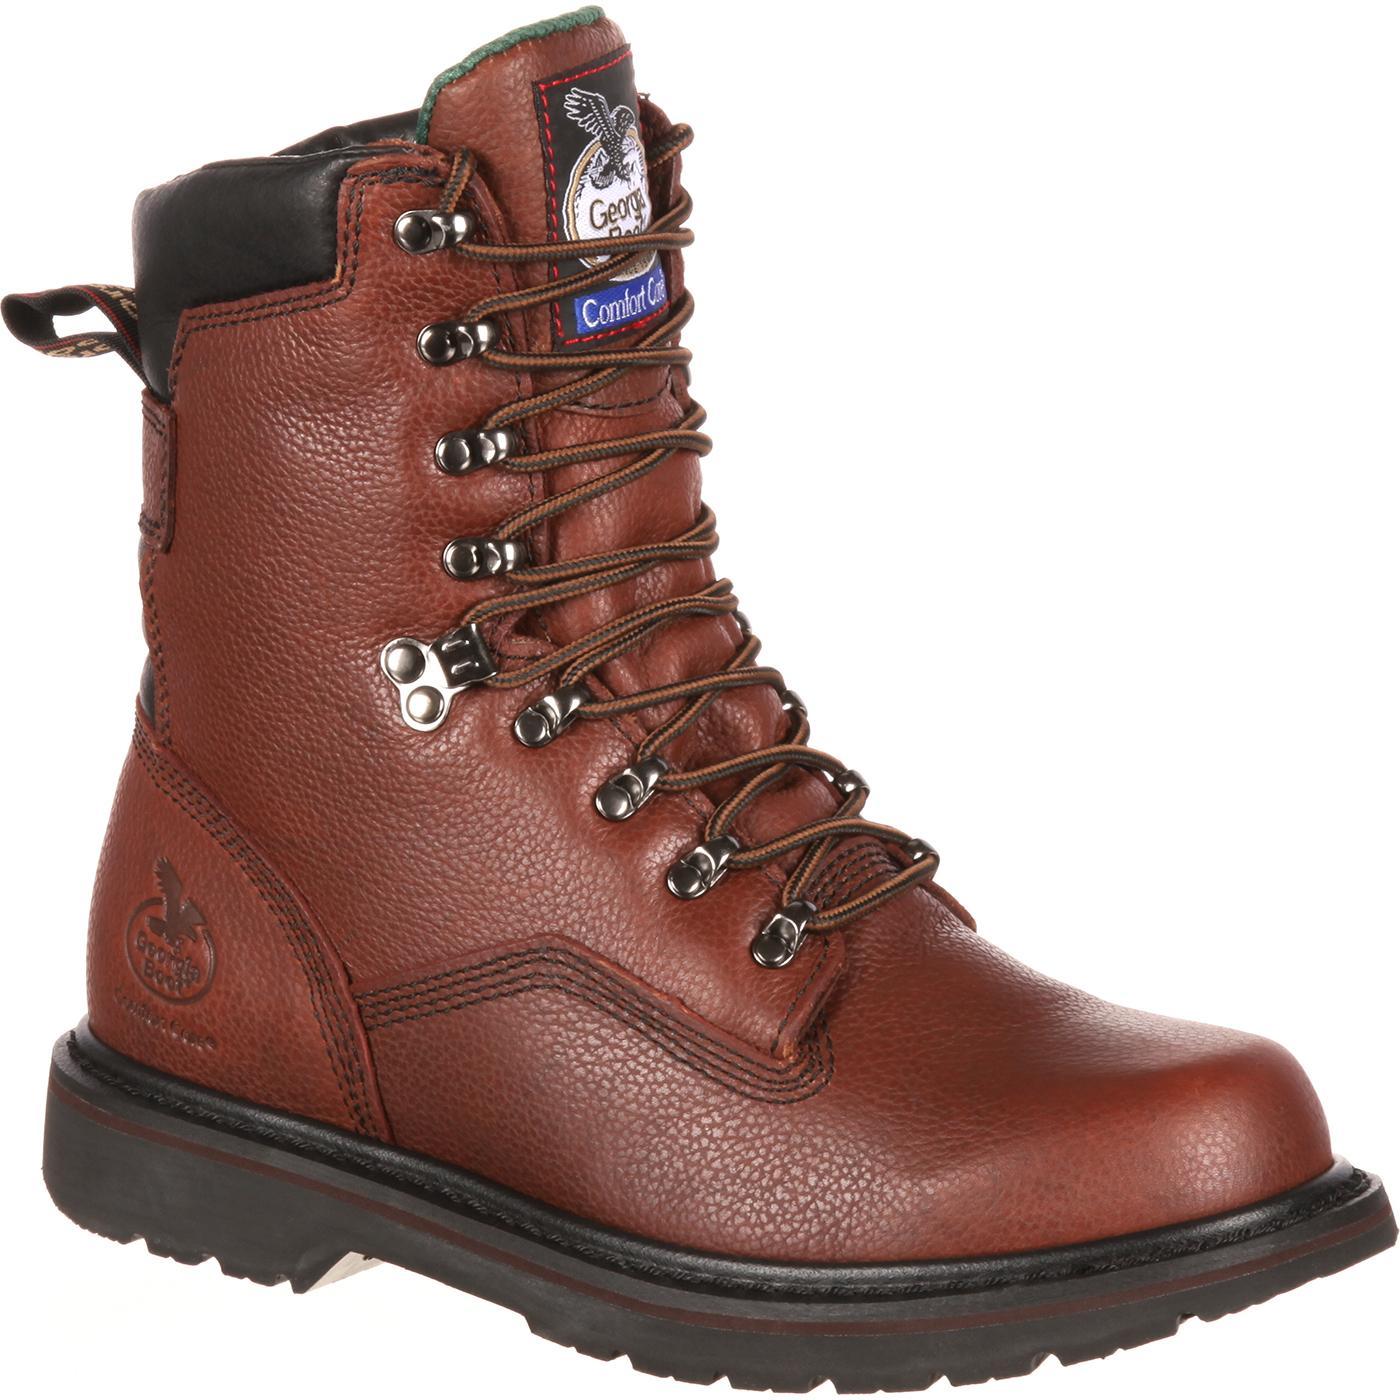 Renegade Men S Work Boots Georgia Boot Style G8114